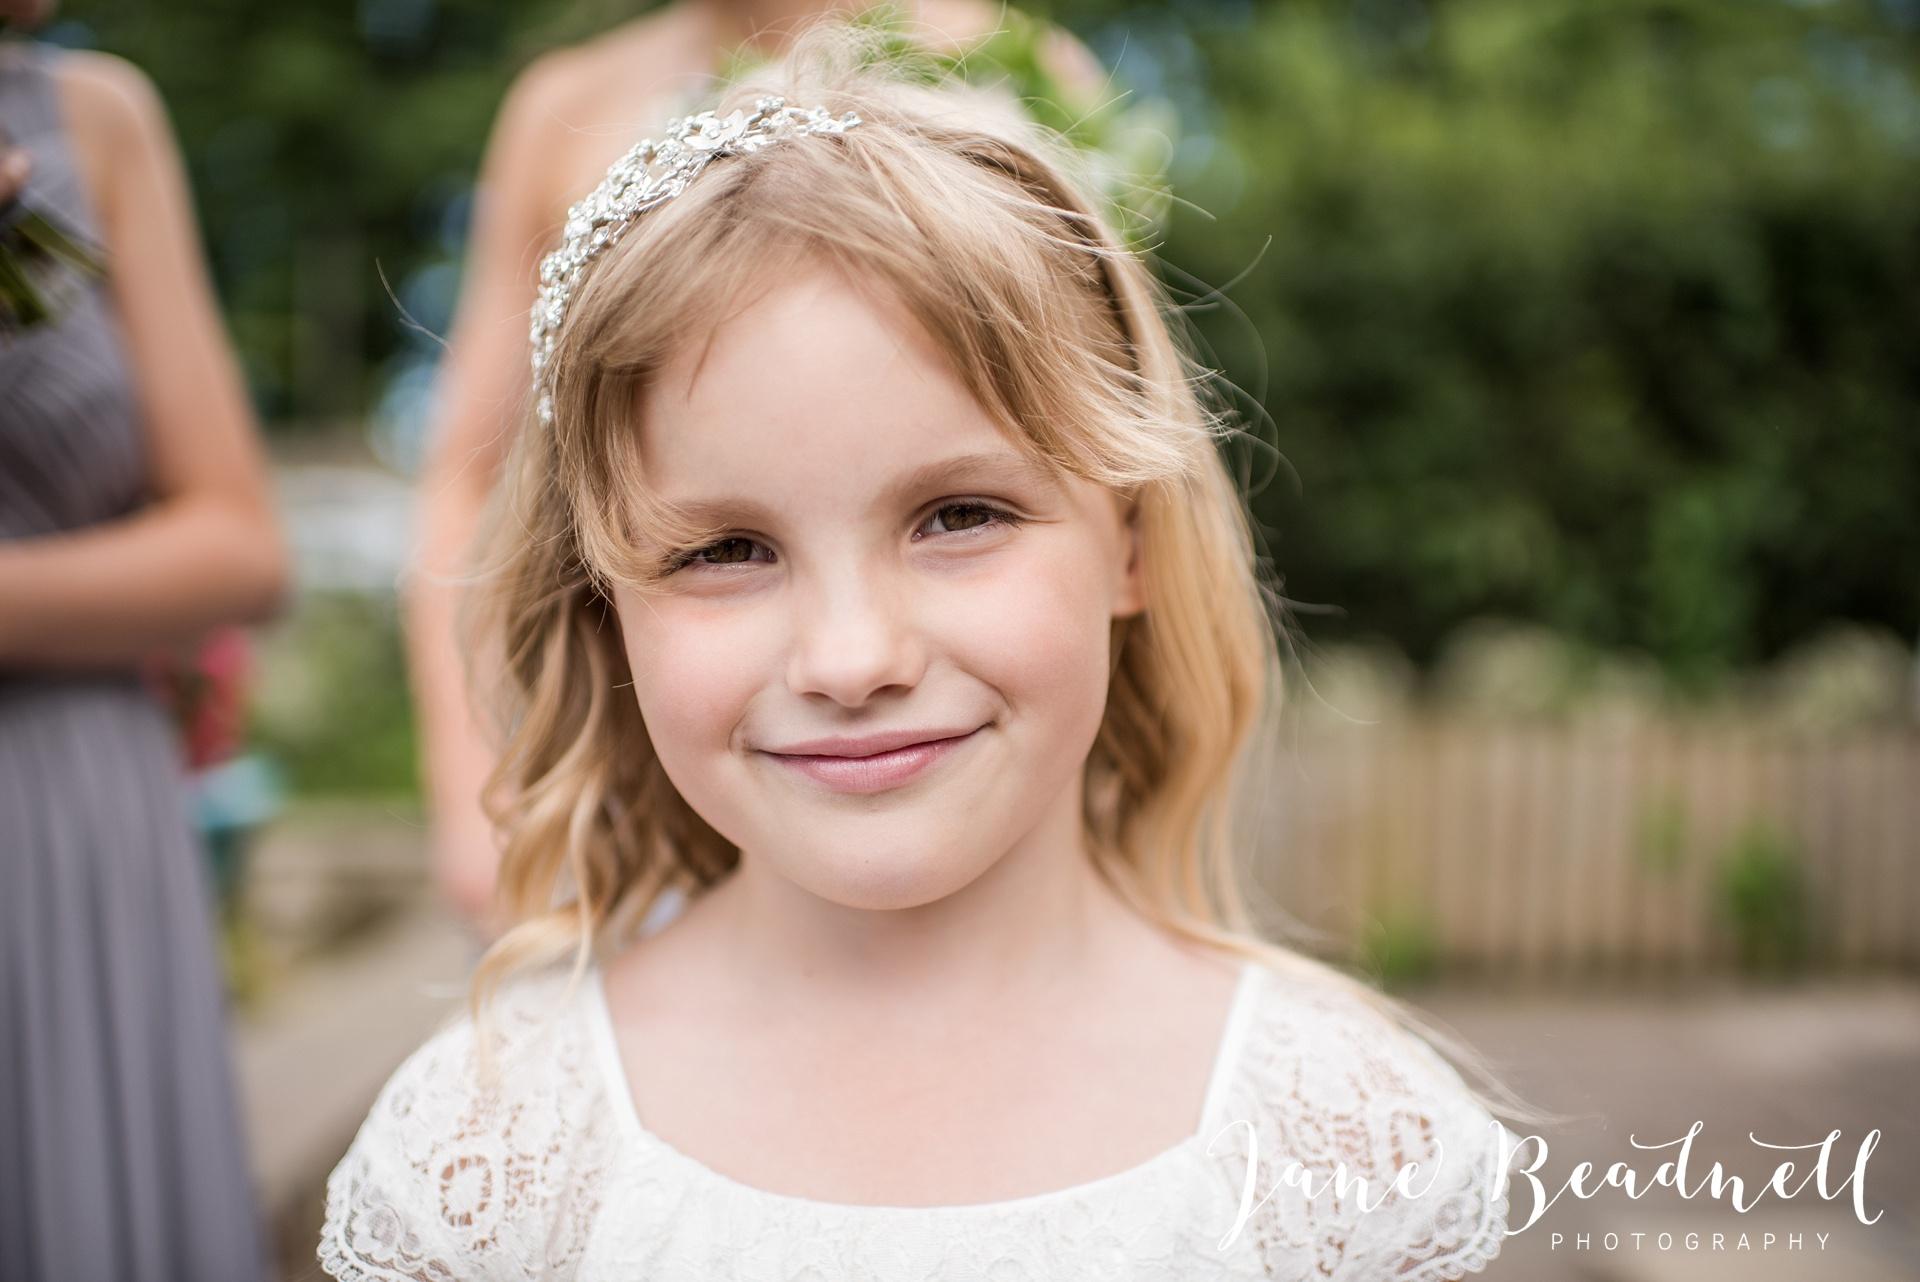 Jervaulx Abbey outdoor wedding Ripon, Yorkshire wedding photographer Jane  Beadnell_0044